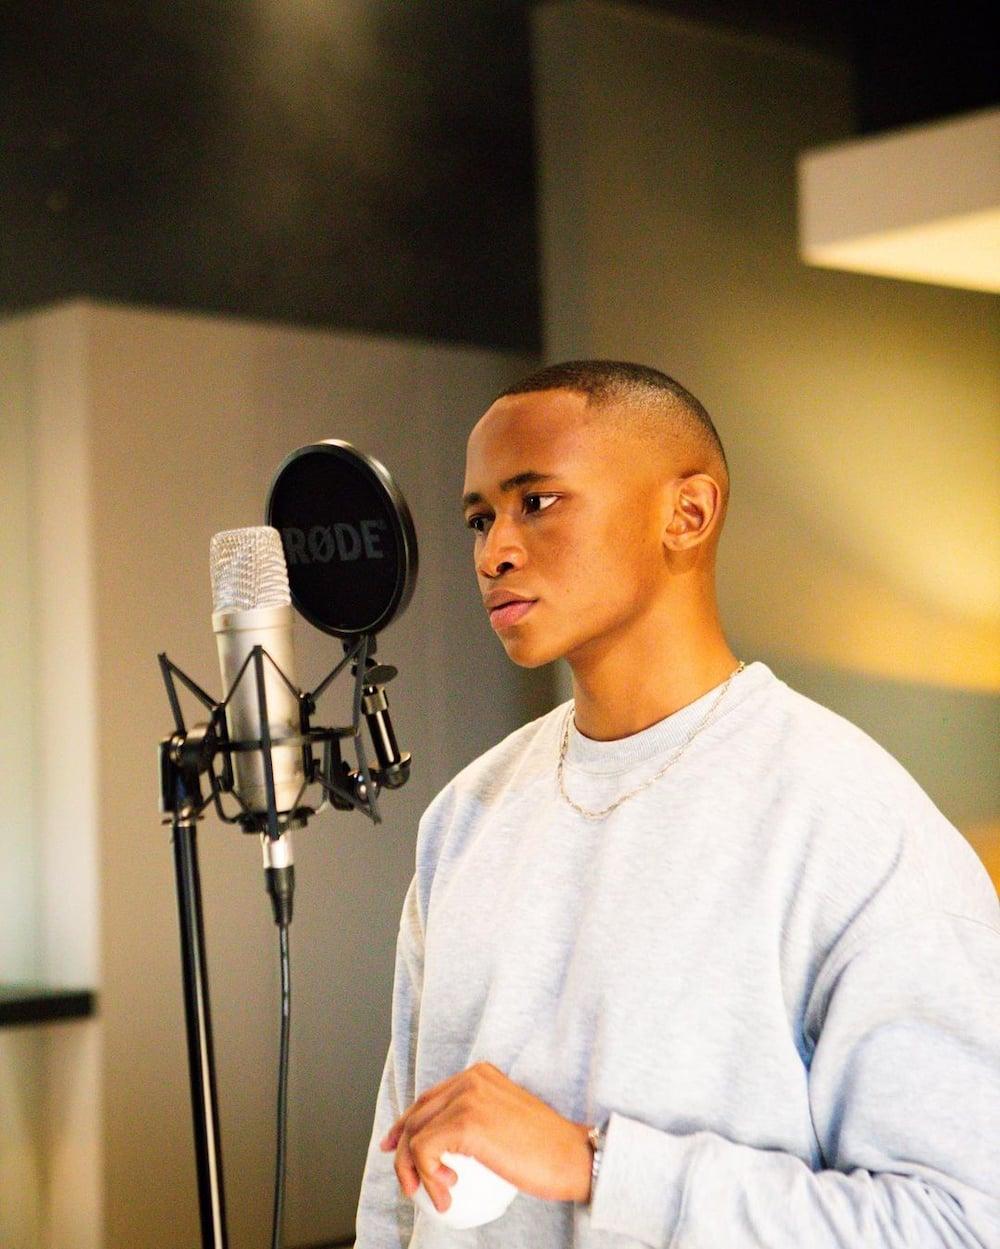 Ntokozo from Gomora singing